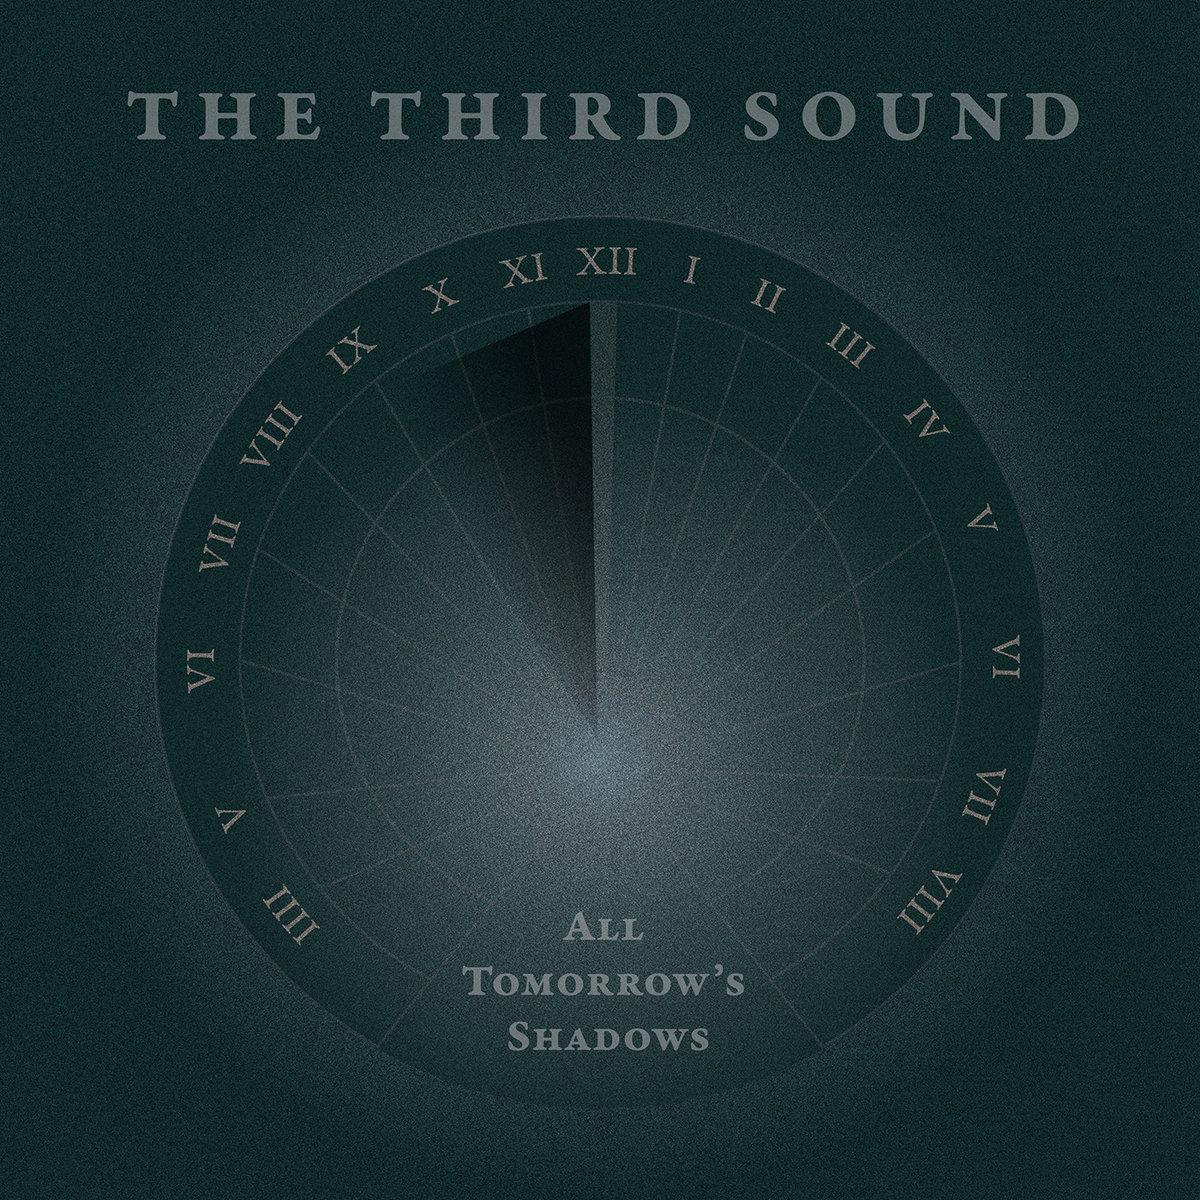 The Third Sound - All Tomorrow's Shadows